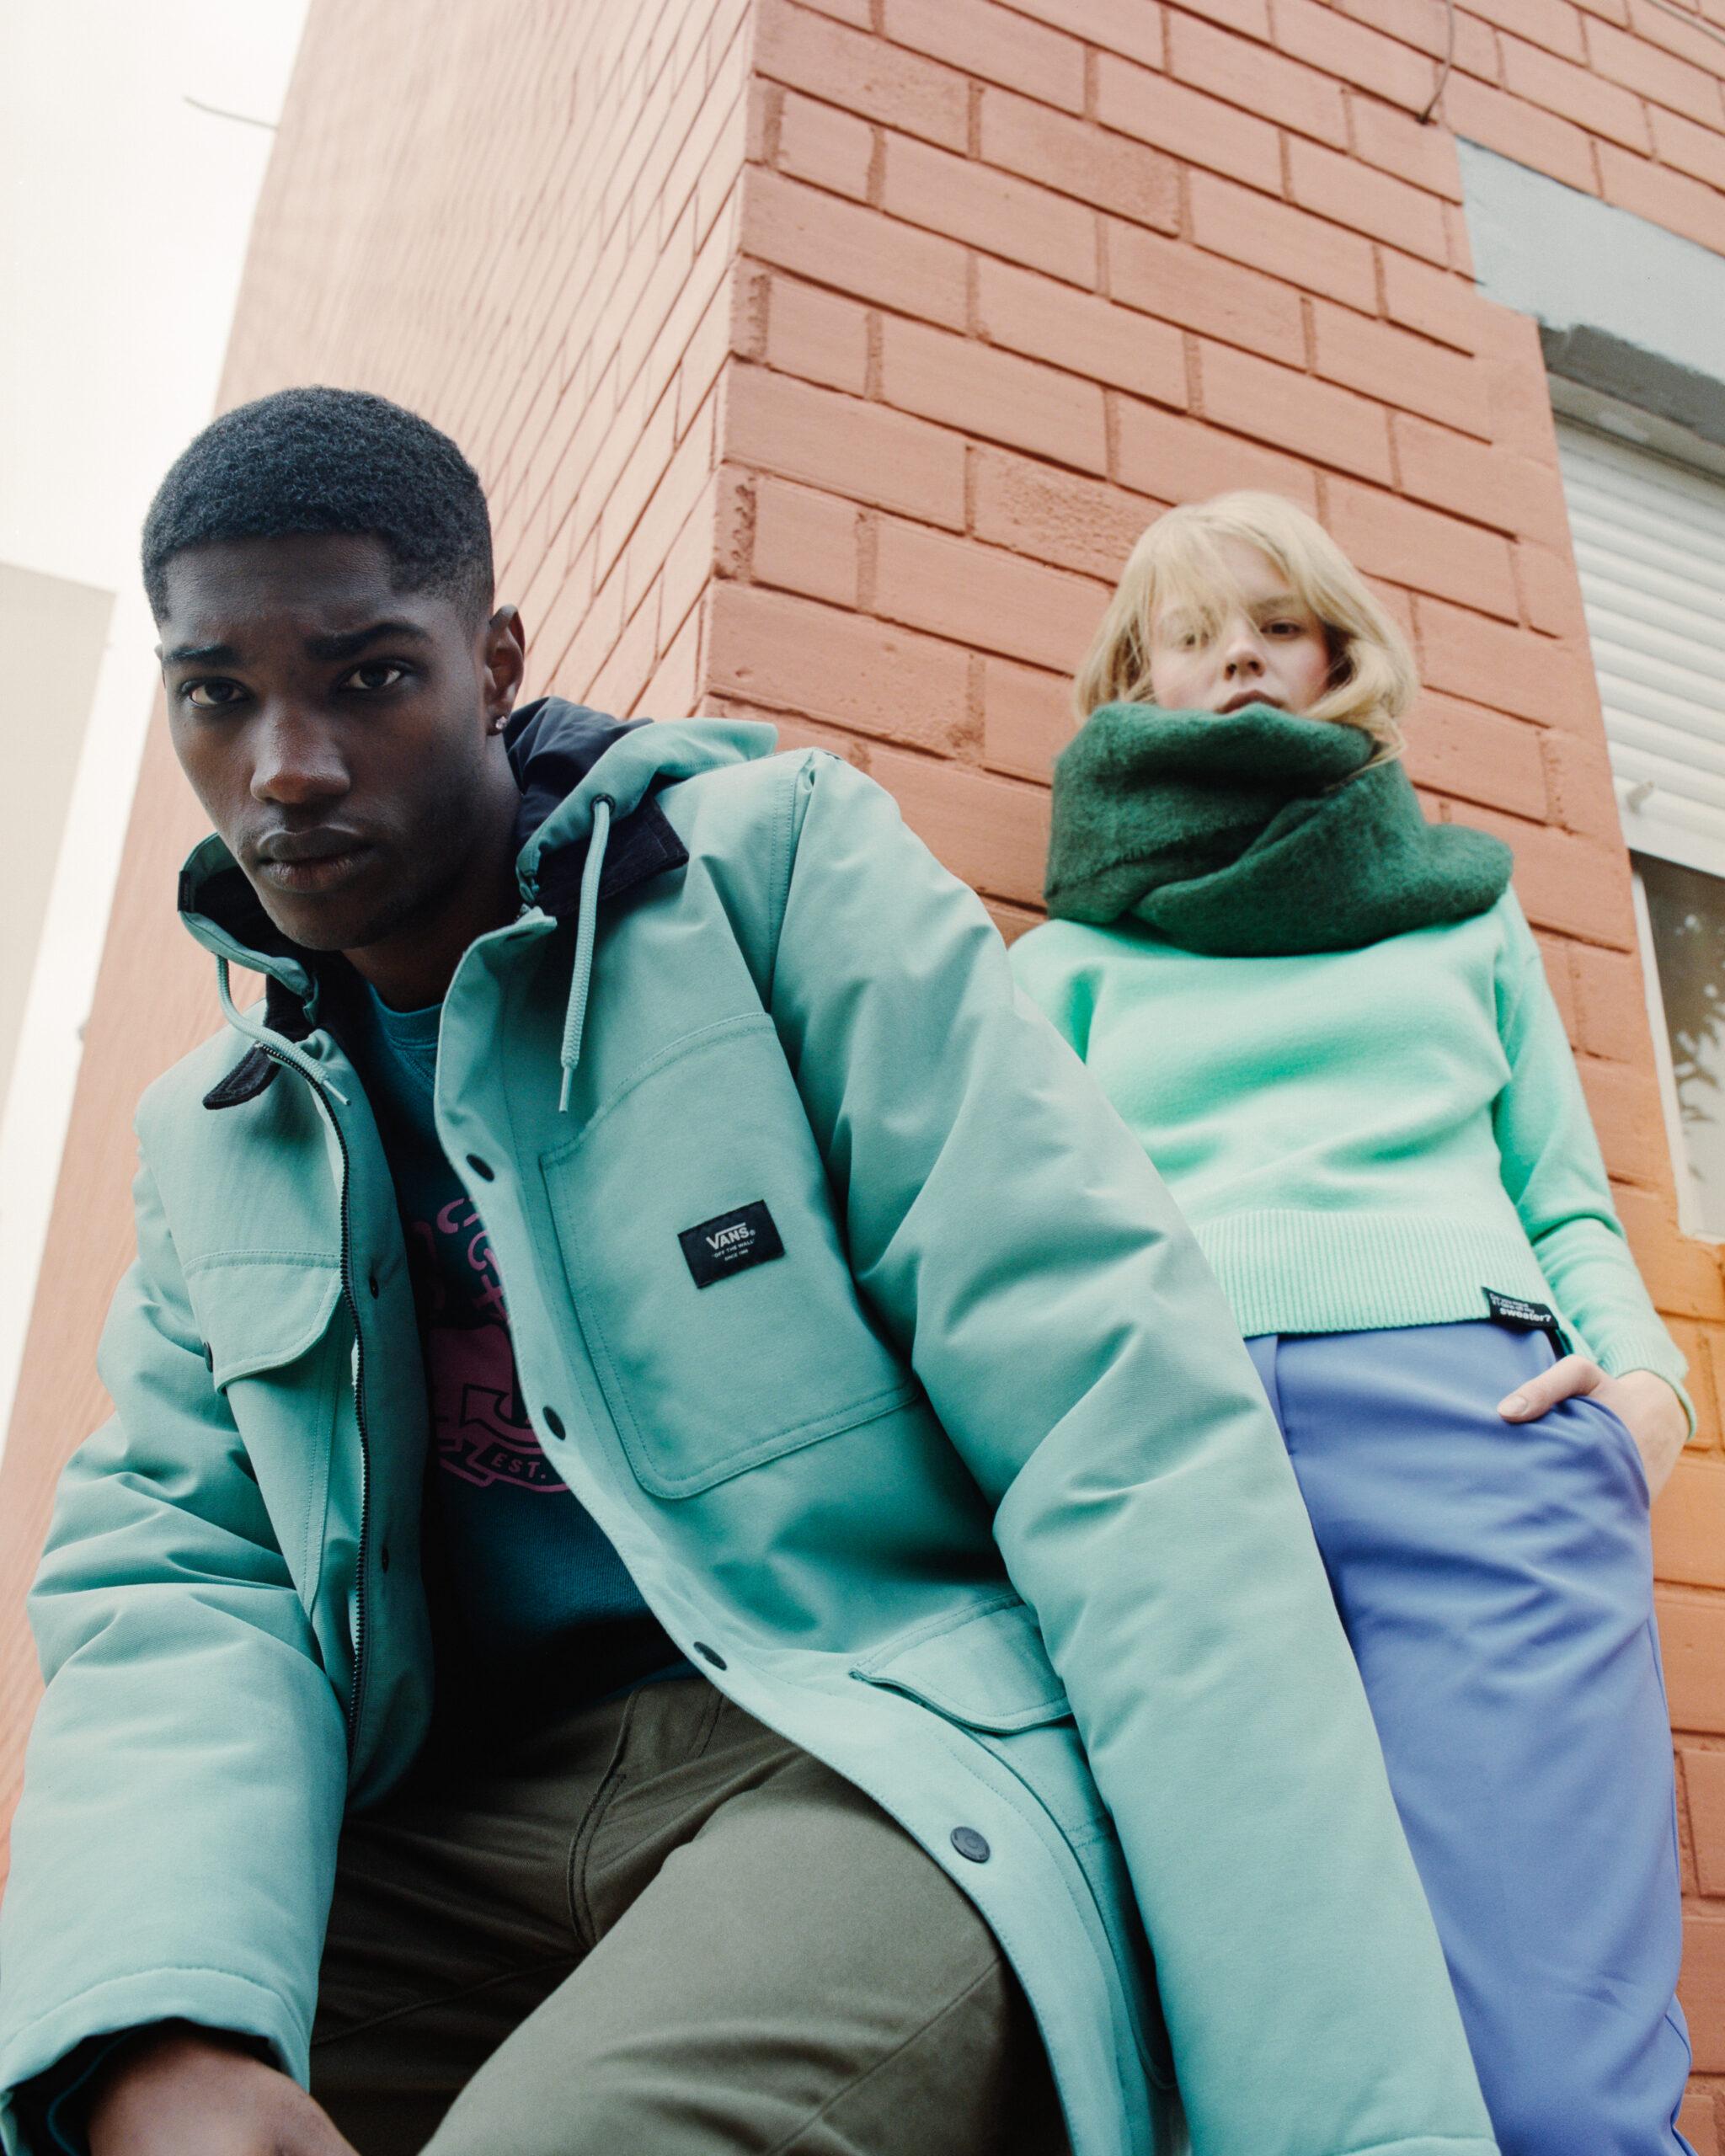 color blocking fashion editorial